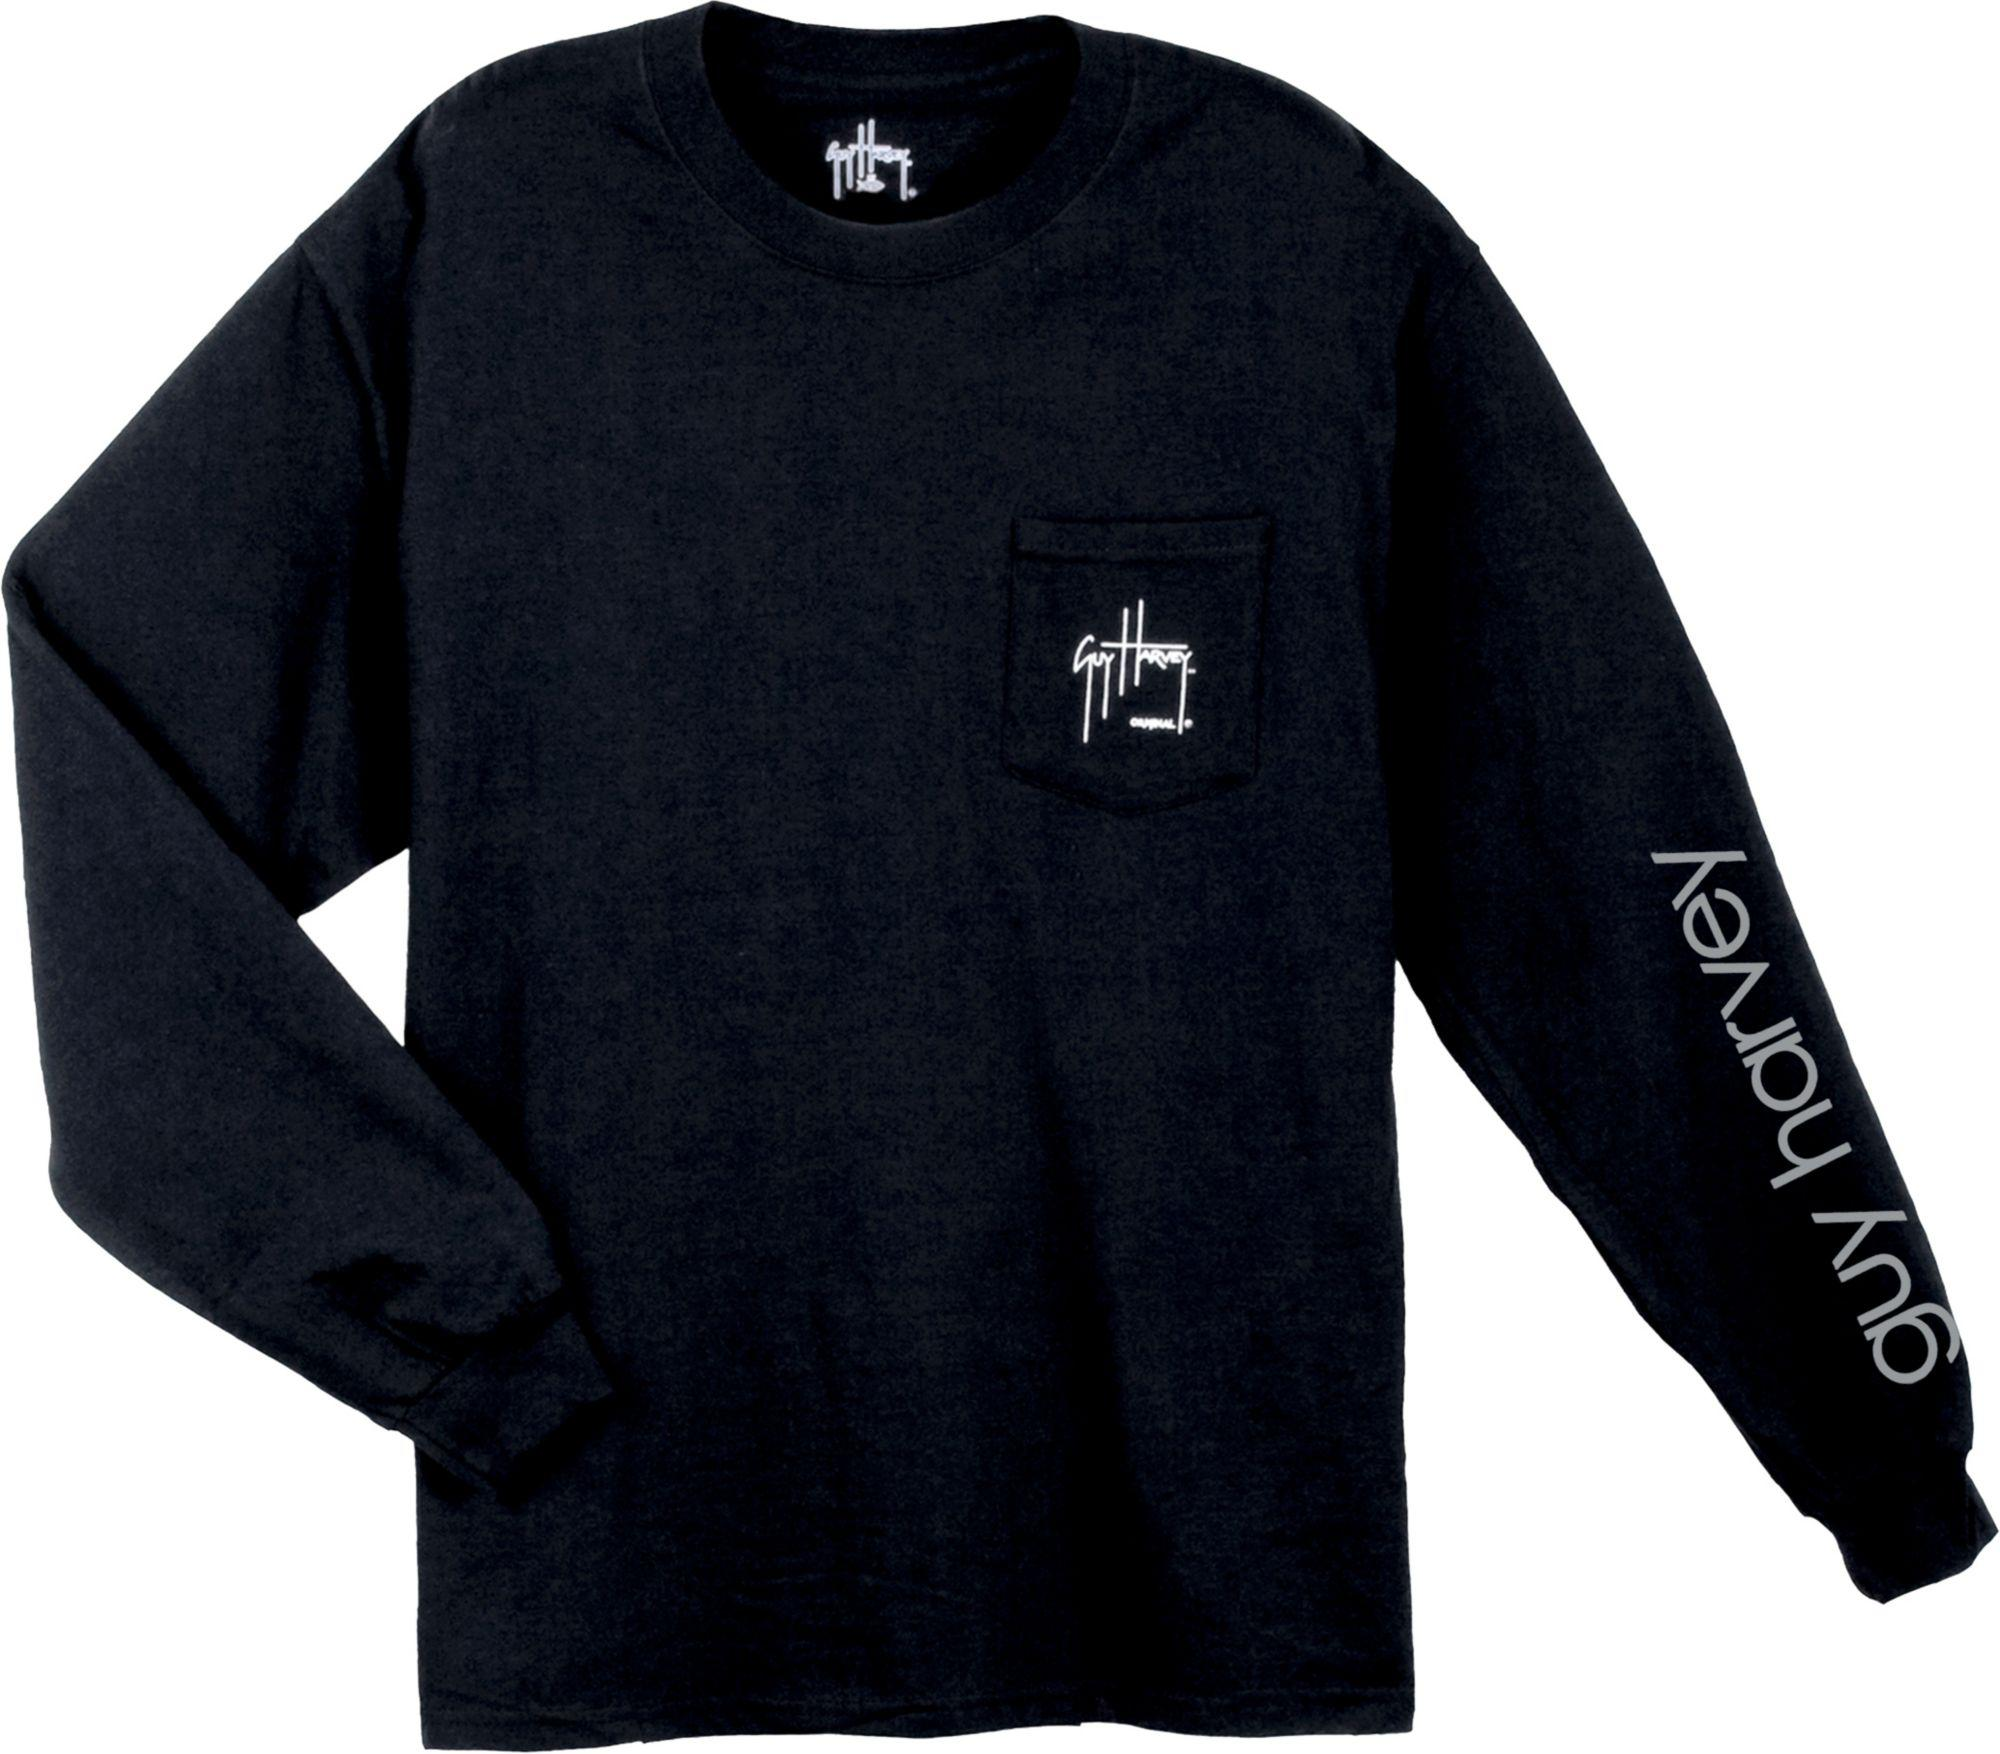 22cee6fe Guy Harvey - Black Woodblock Long Sleeve Shirt for Men - Lyst. View  fullscreen